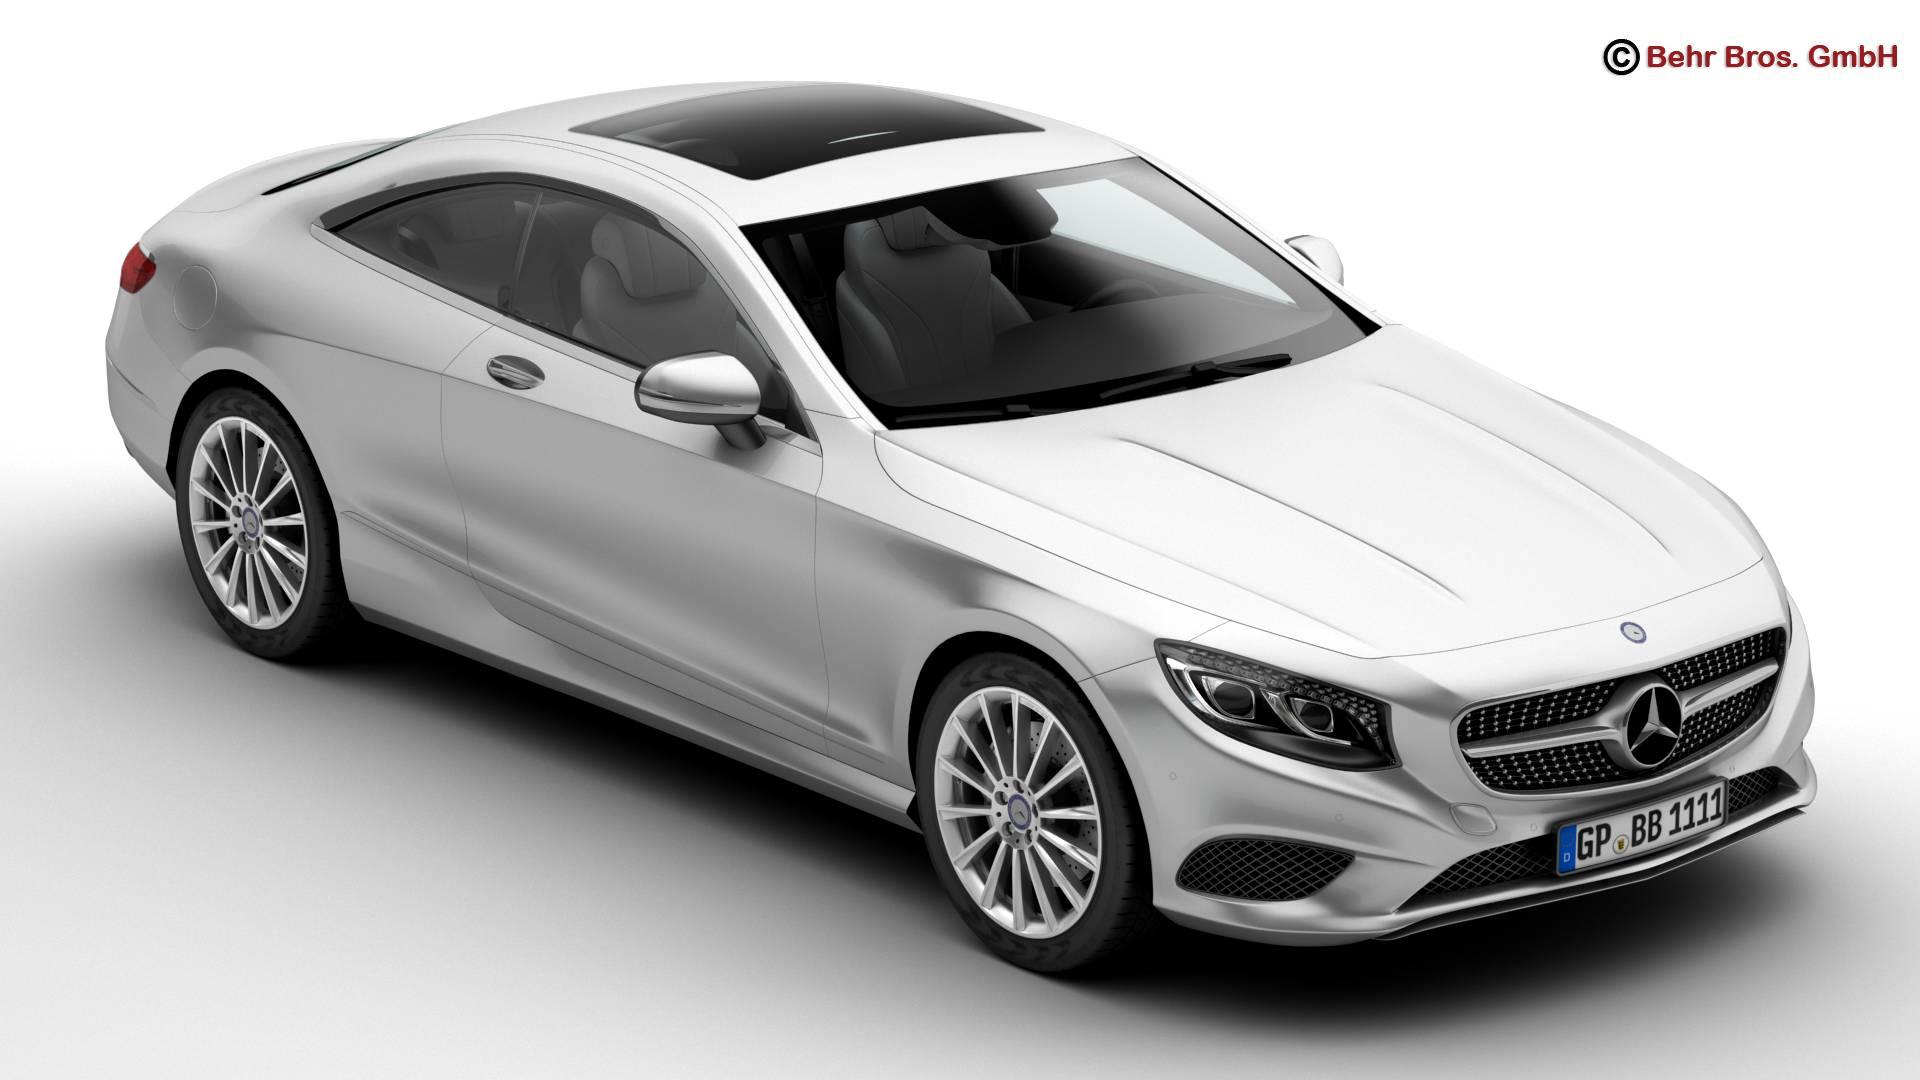 mercedes s class coupe 2015 2 headlight versions 3d model 3ds max fbx c4d lwo ma mb obj 206701